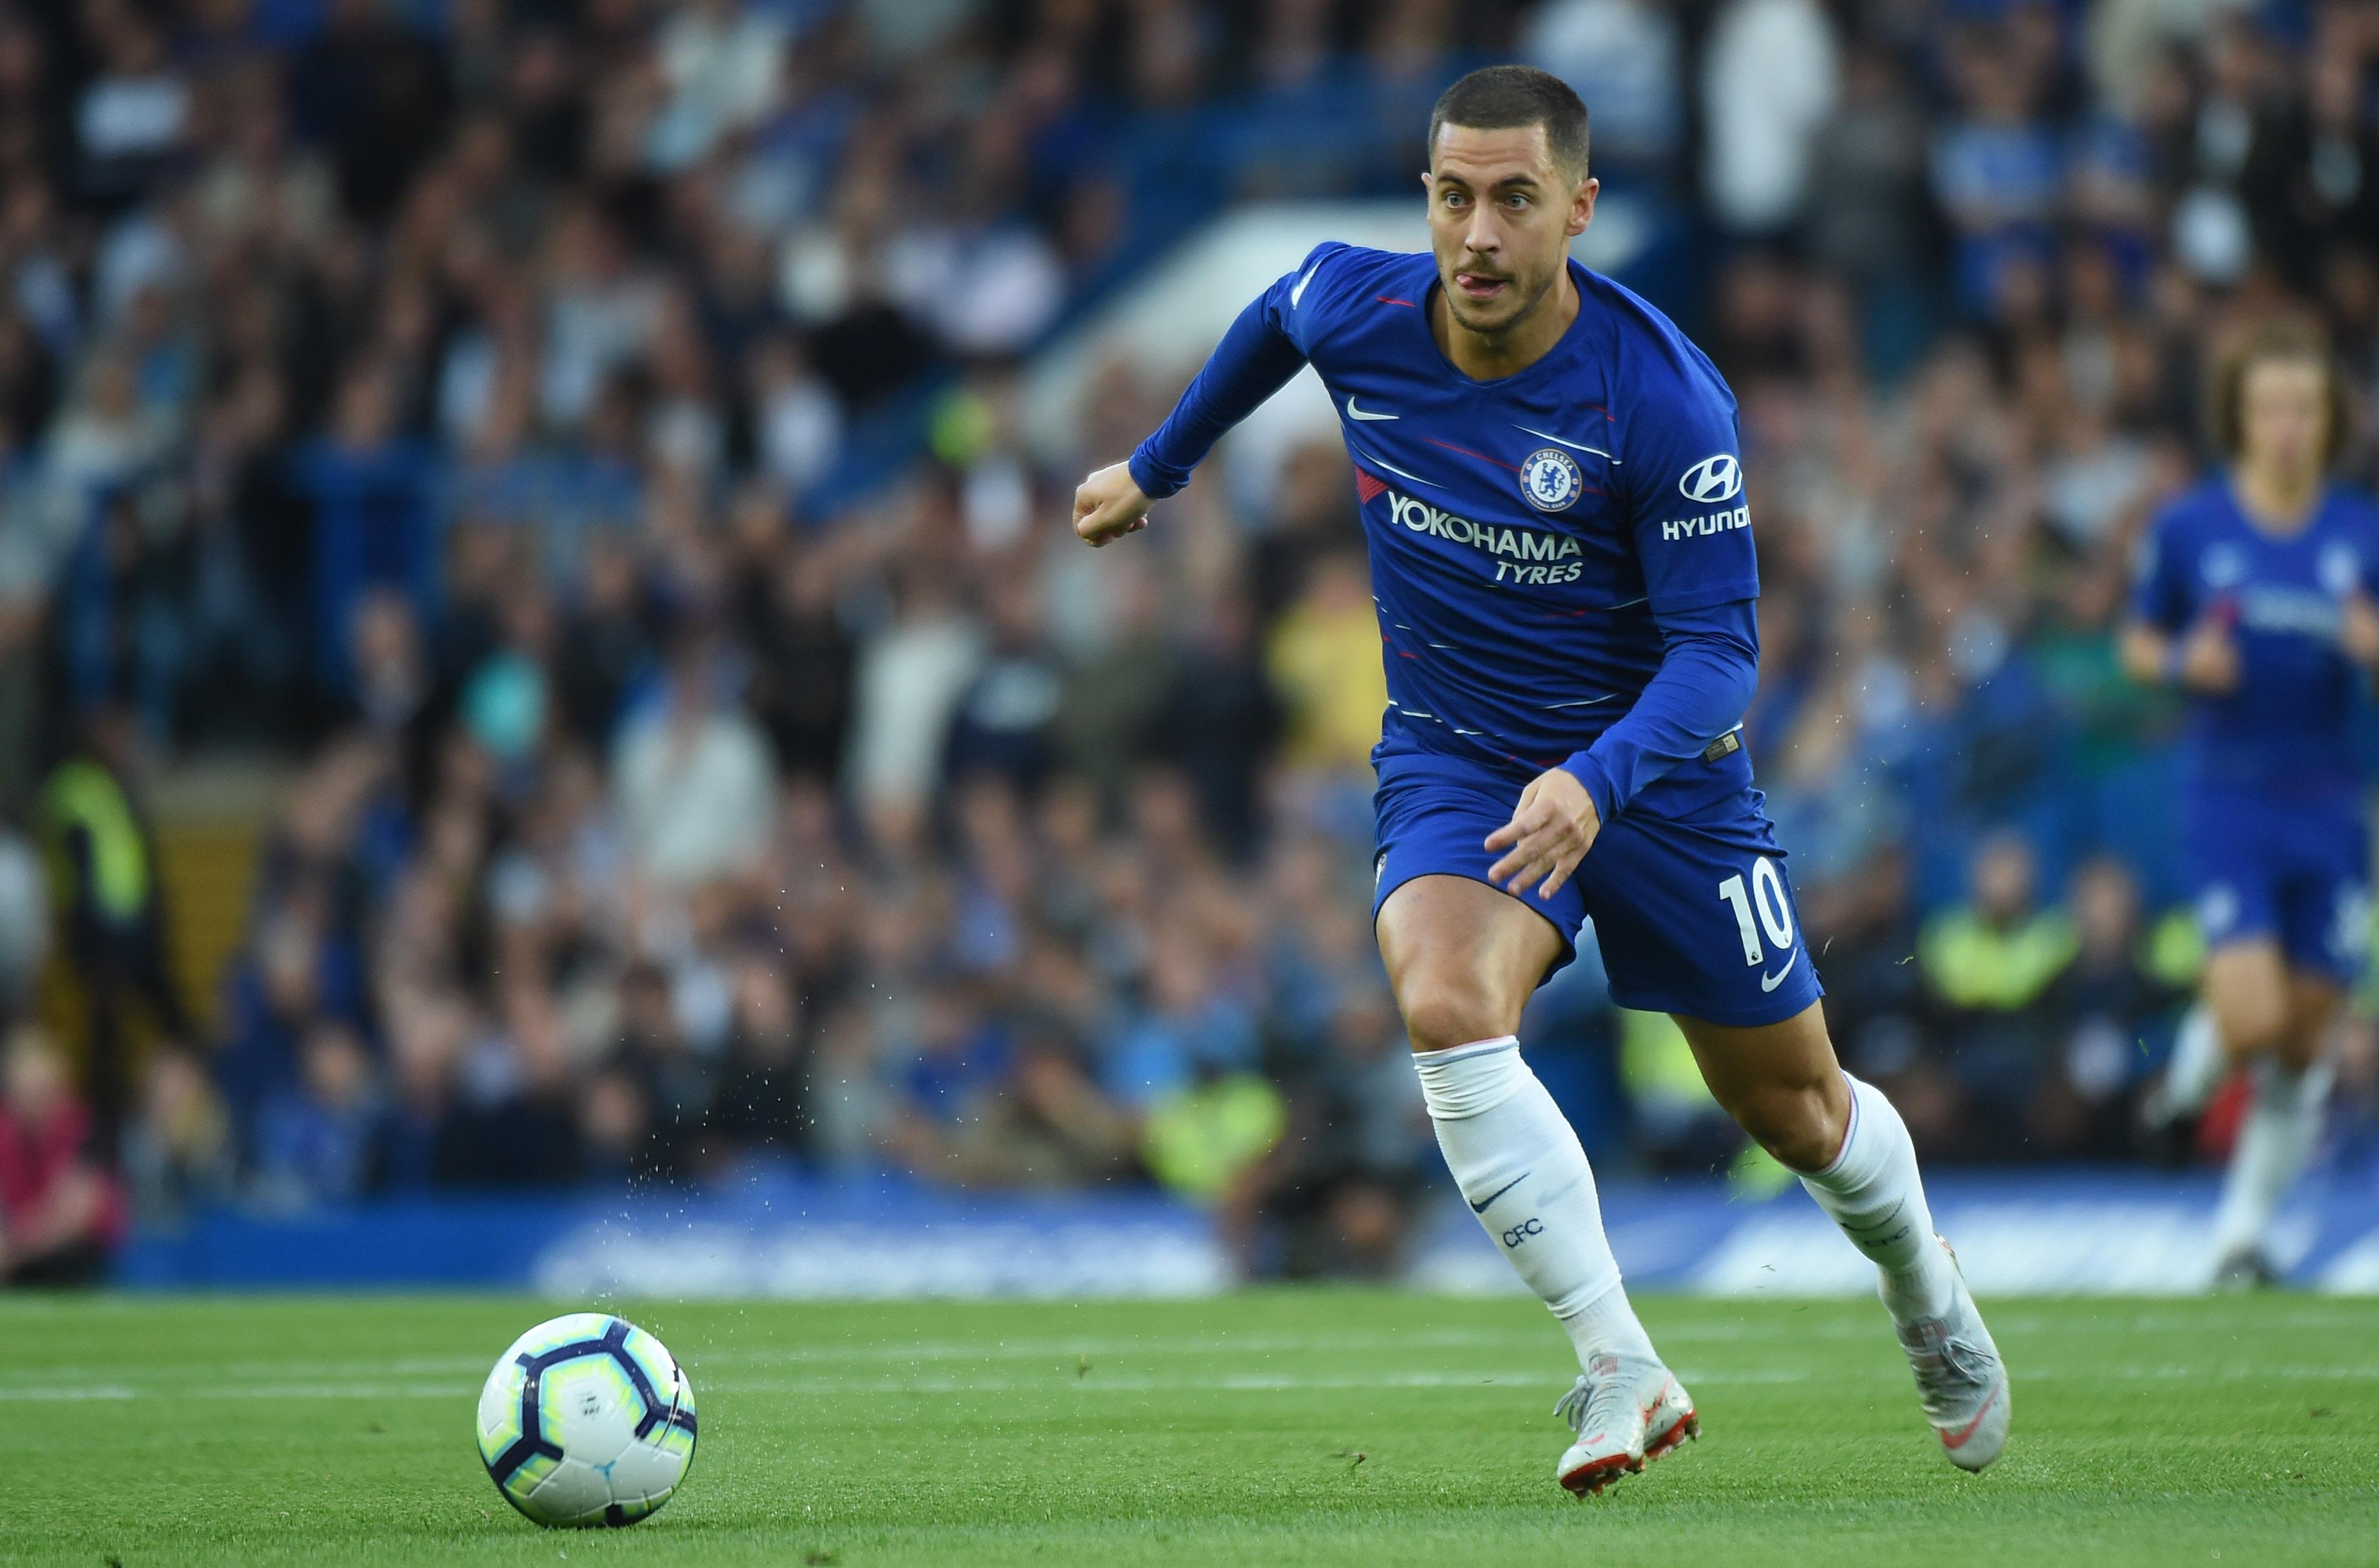 Football - Etranger - Premier League: Brighton-Chelsea en direct